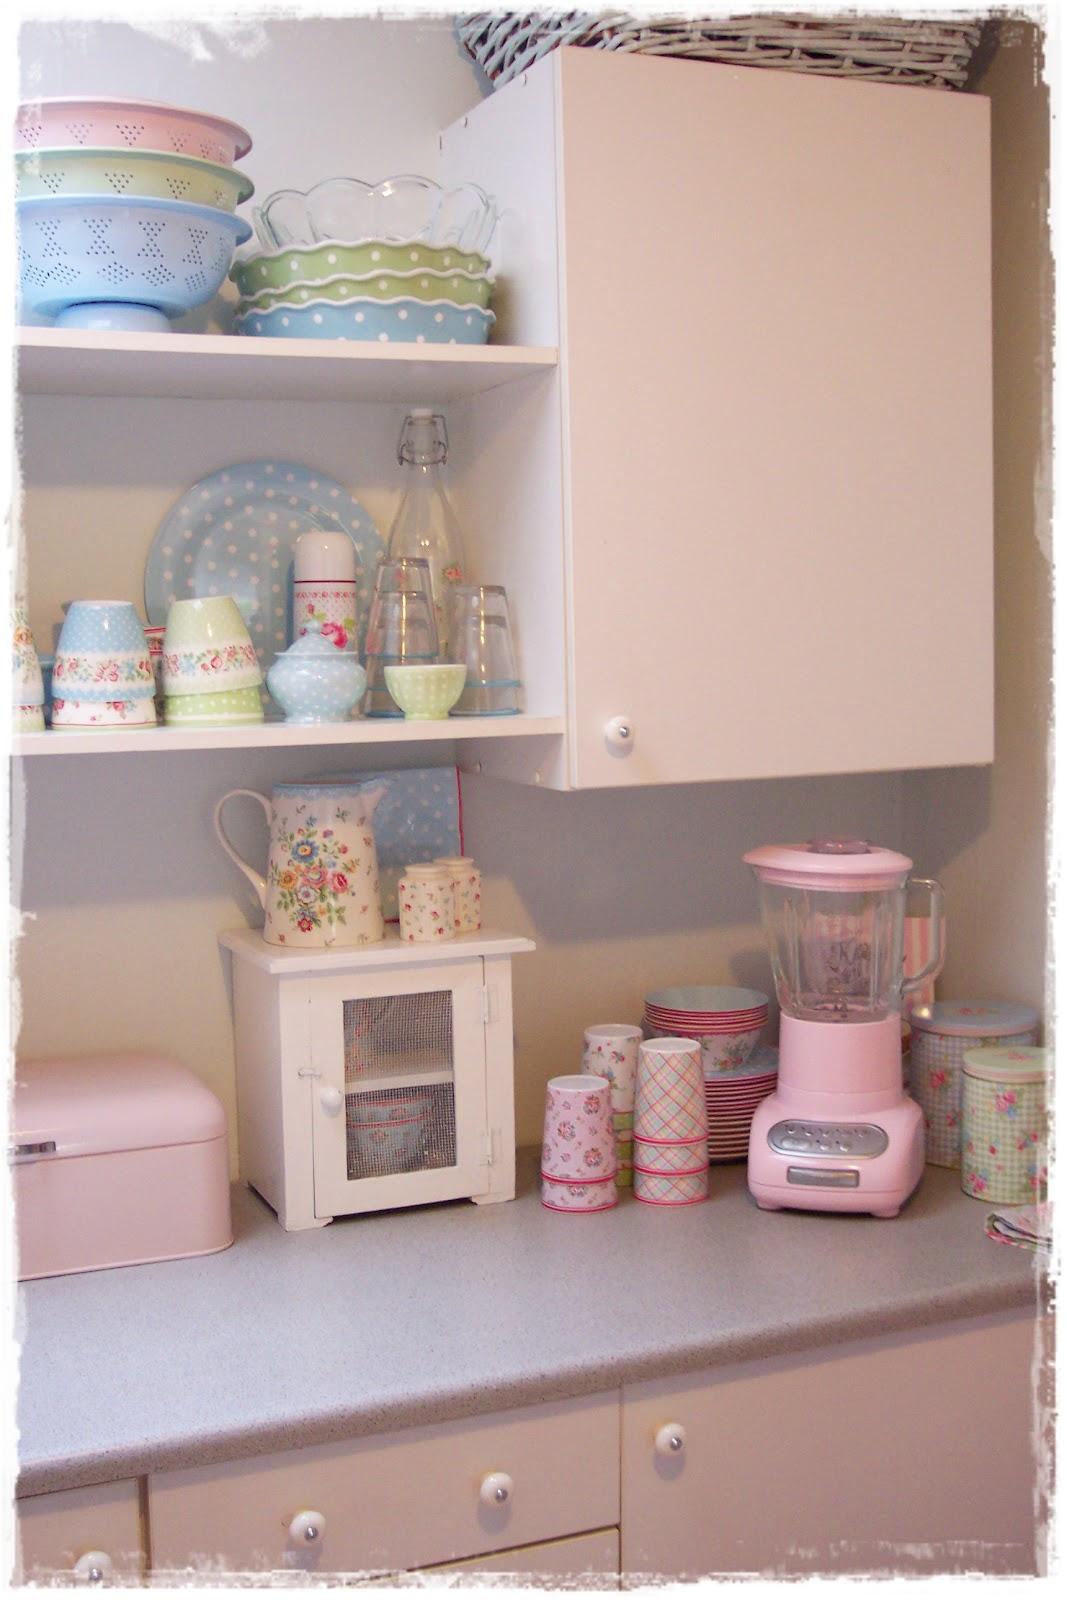 Lulufant Stemnings billeder fra mit lille køkken -> Kuchnia Dodatki Inspiracje